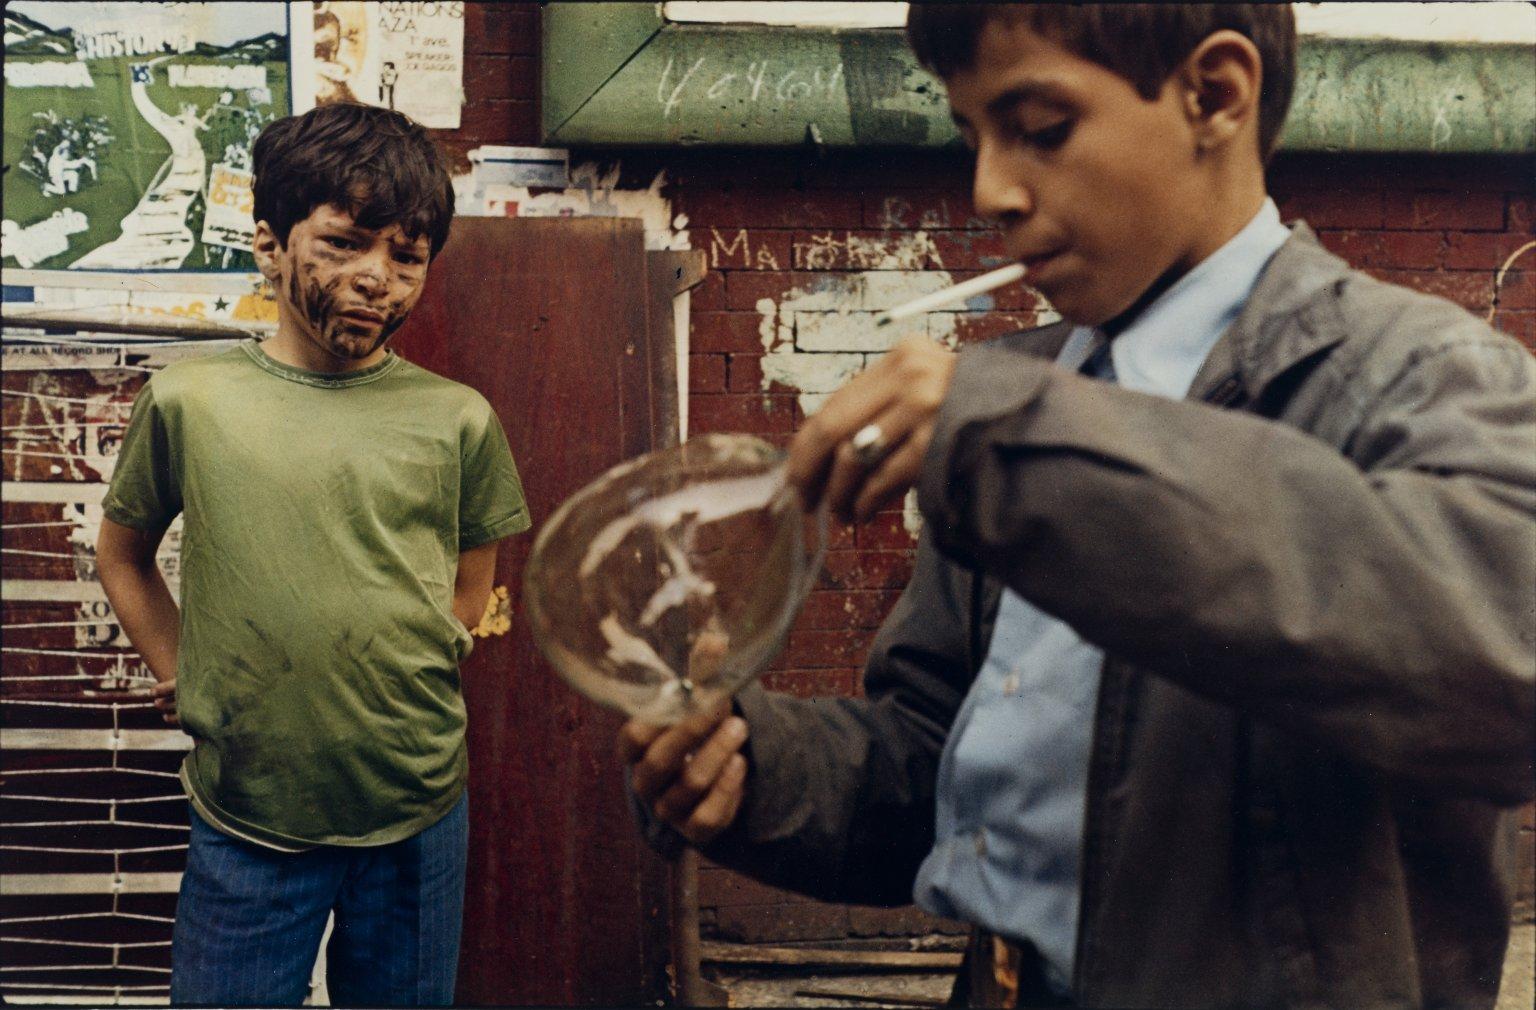 Boy with Bubble, 1972 photograph by Helen Levitt